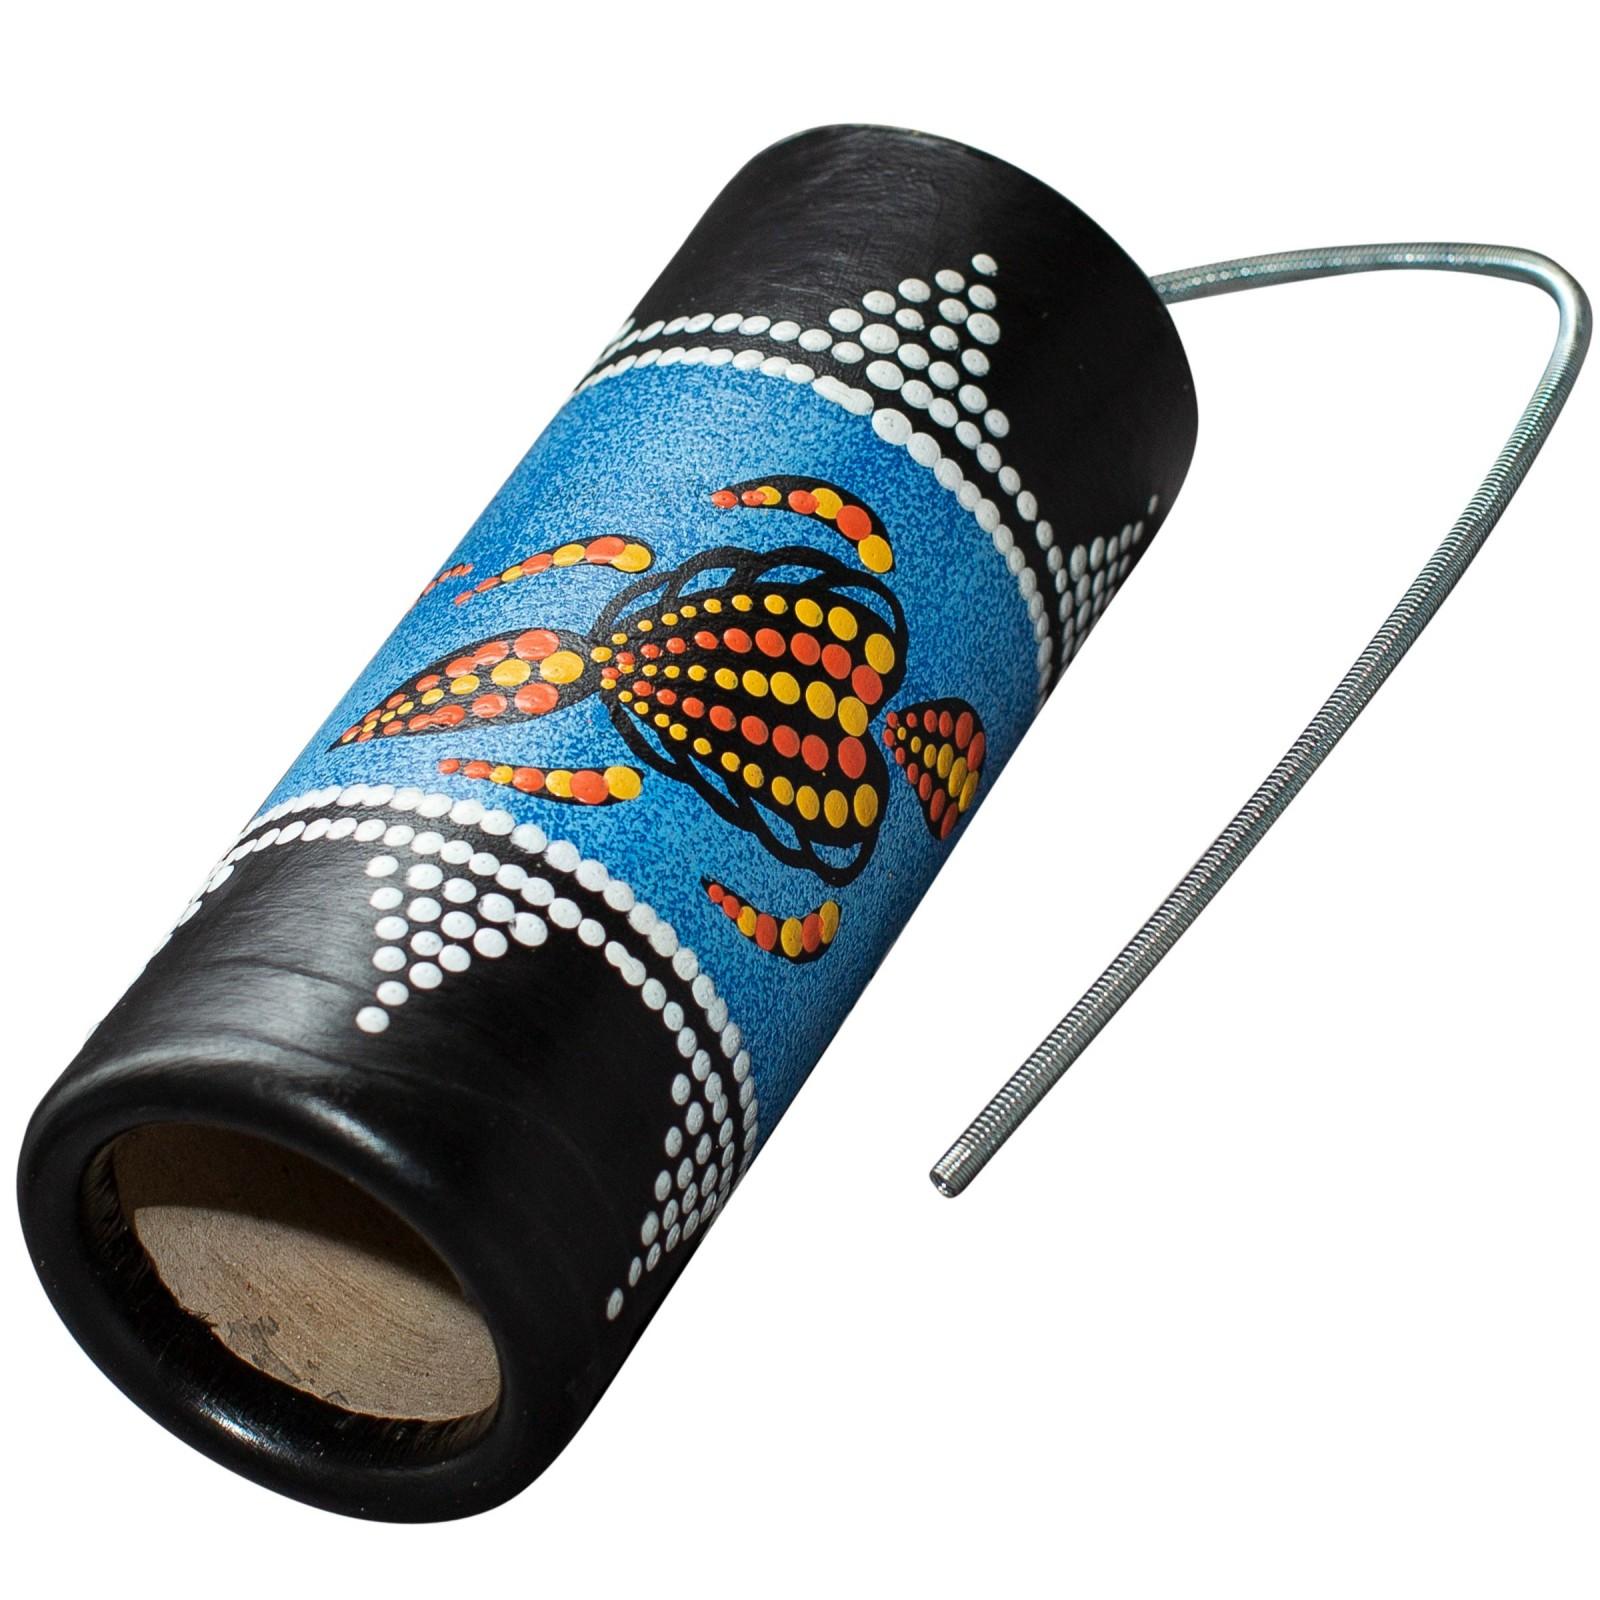 Donner-trommel  AT- BLTD-25, Donnermacher – Klanginstrument für Kinder. Länge 25 cm